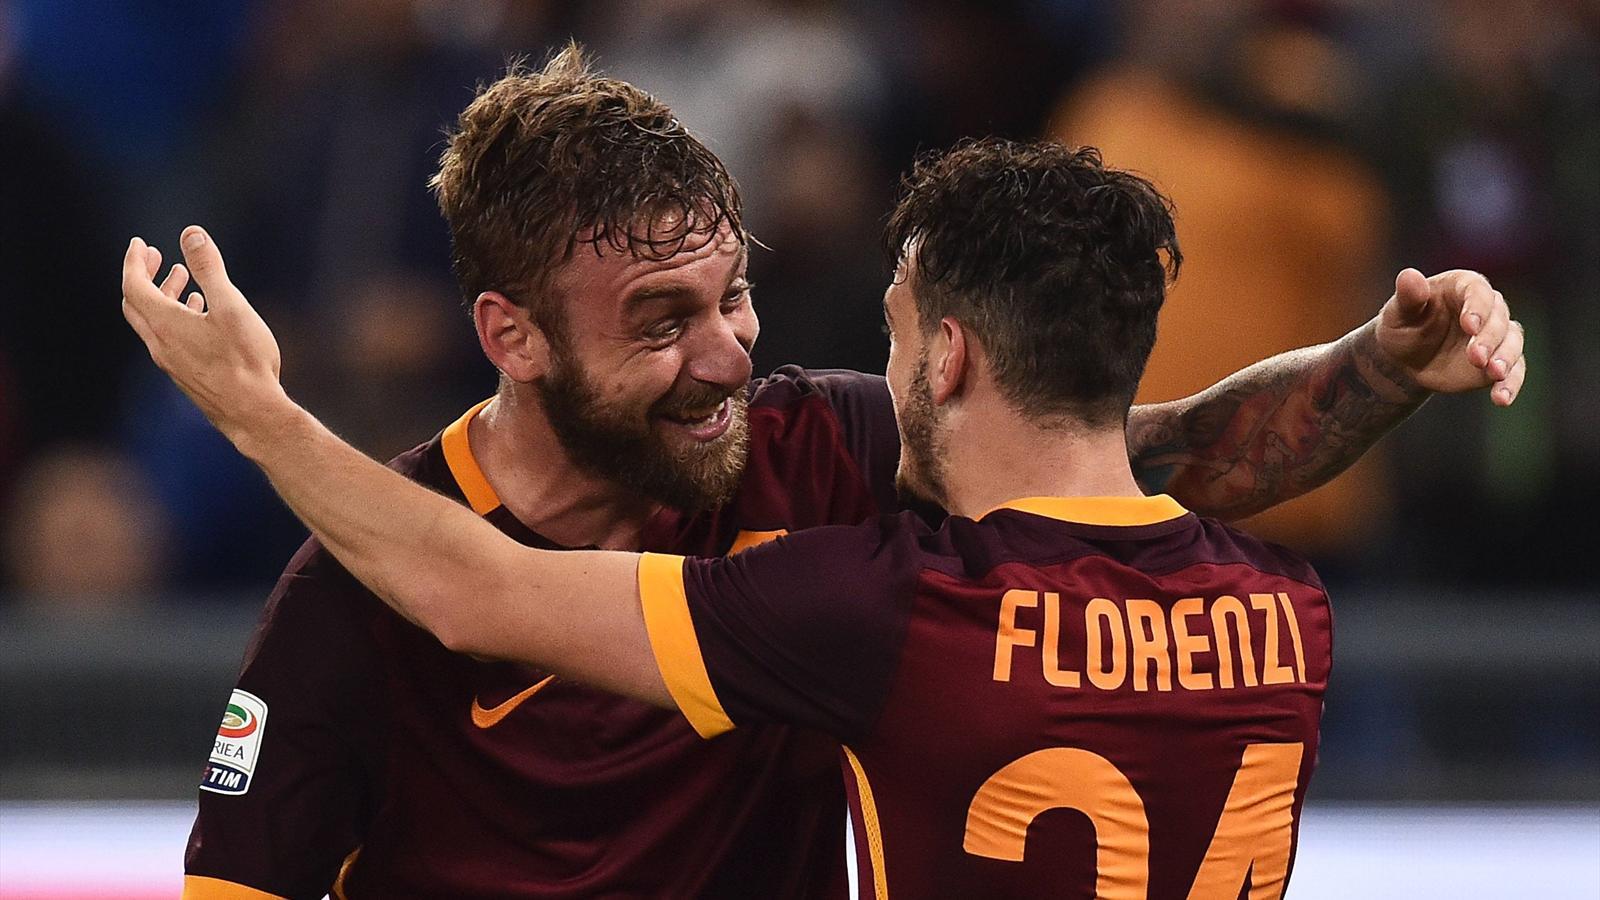 Daniele de Rossi and Alessandro Florenzi celebrate goal during Roma vs Empoli game – PUB NOT IN FRA ITA